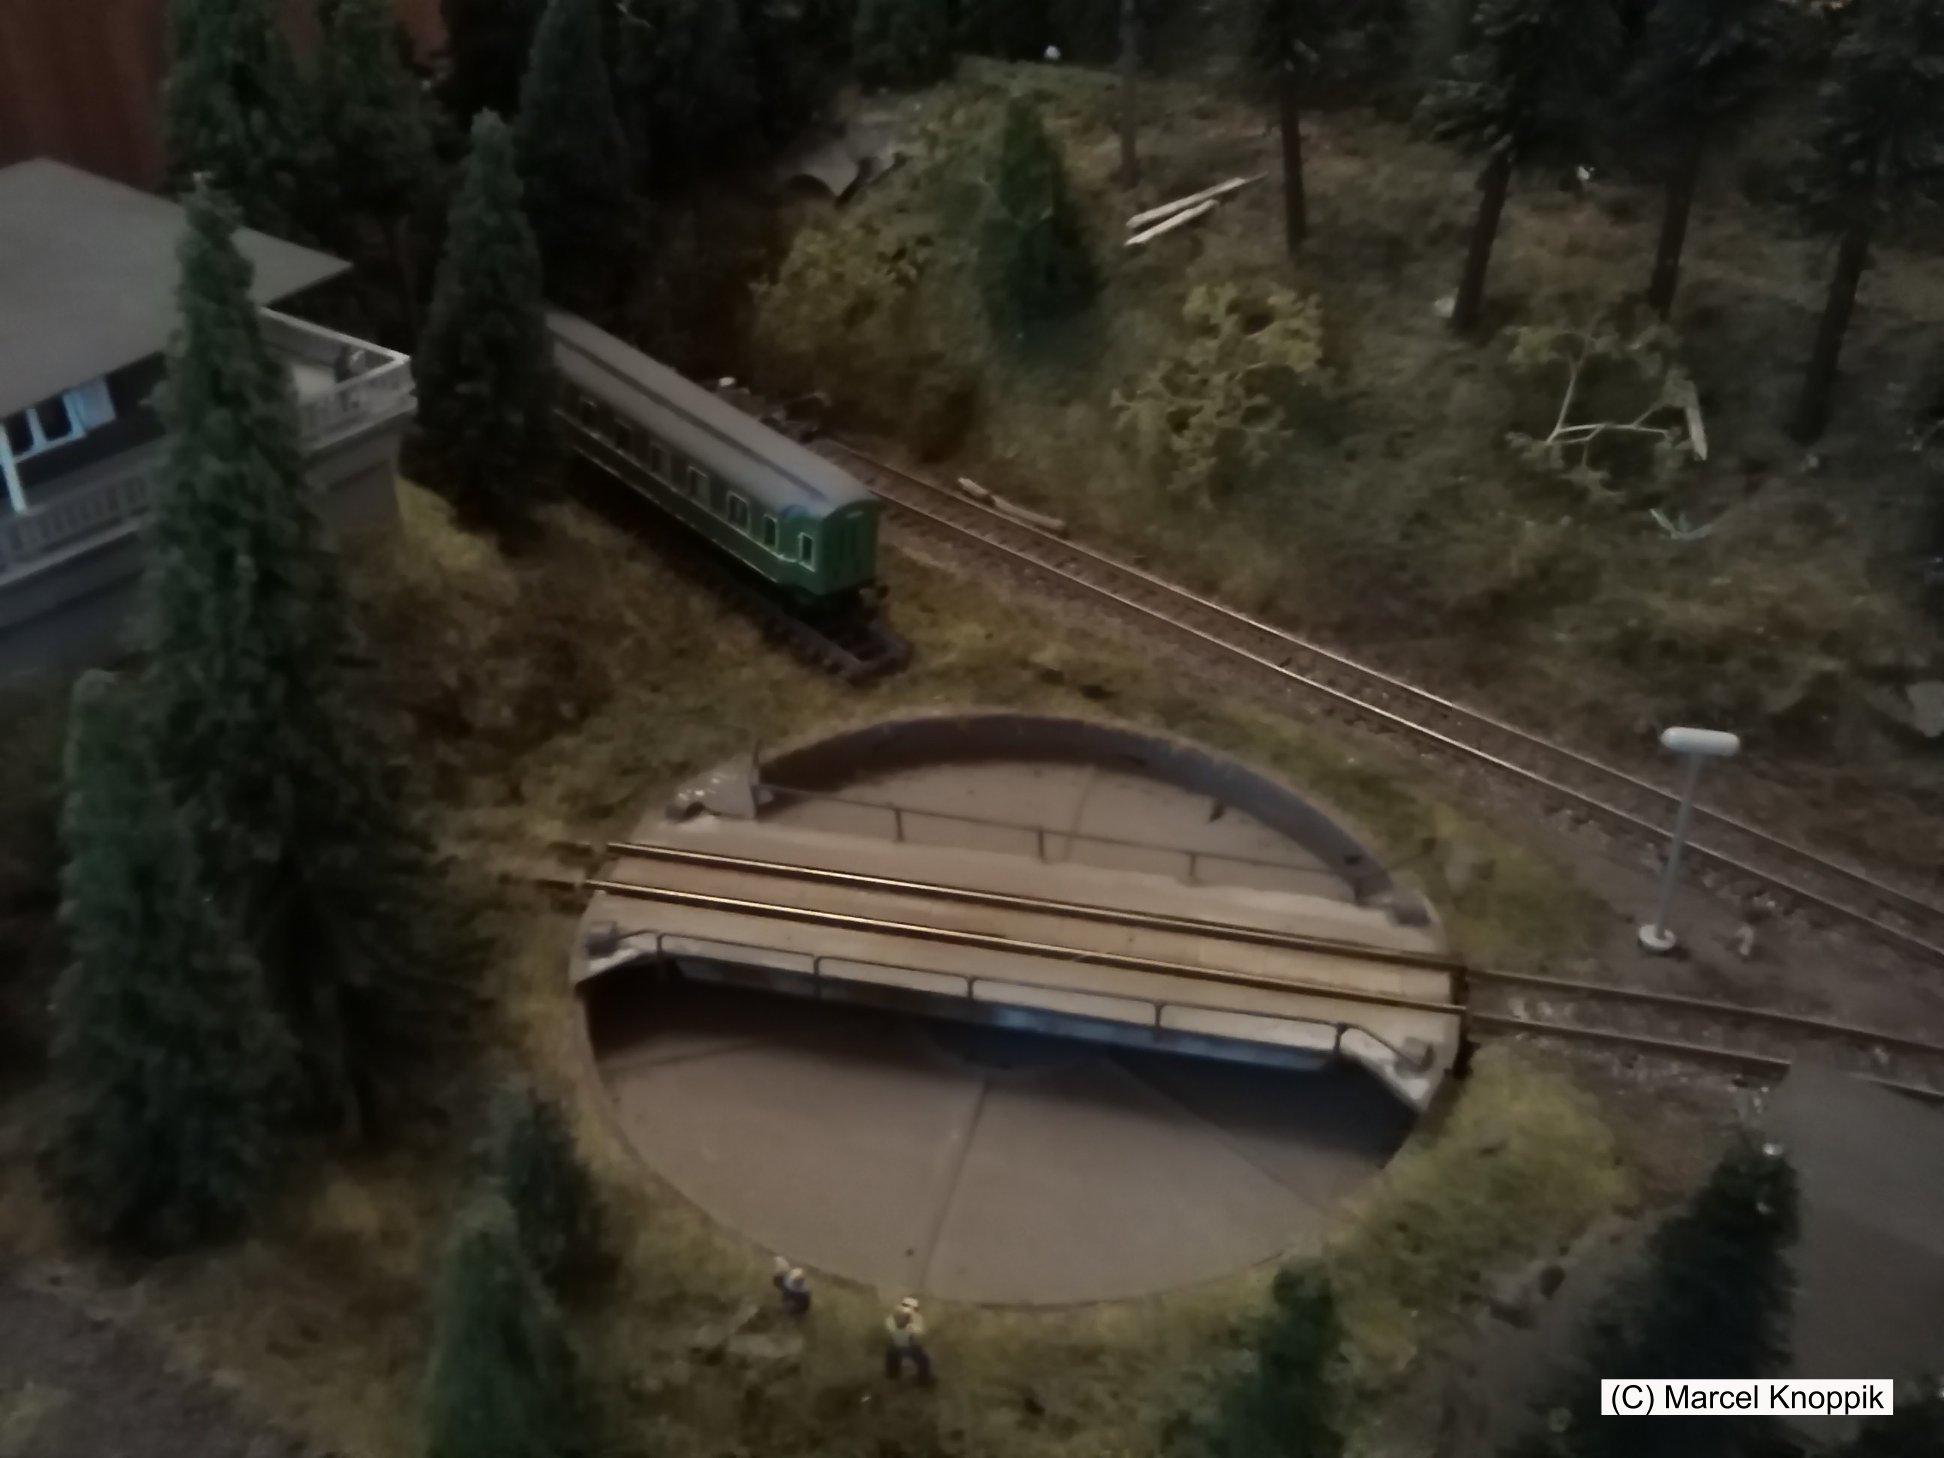 Modell vom Bahnhof Altenau